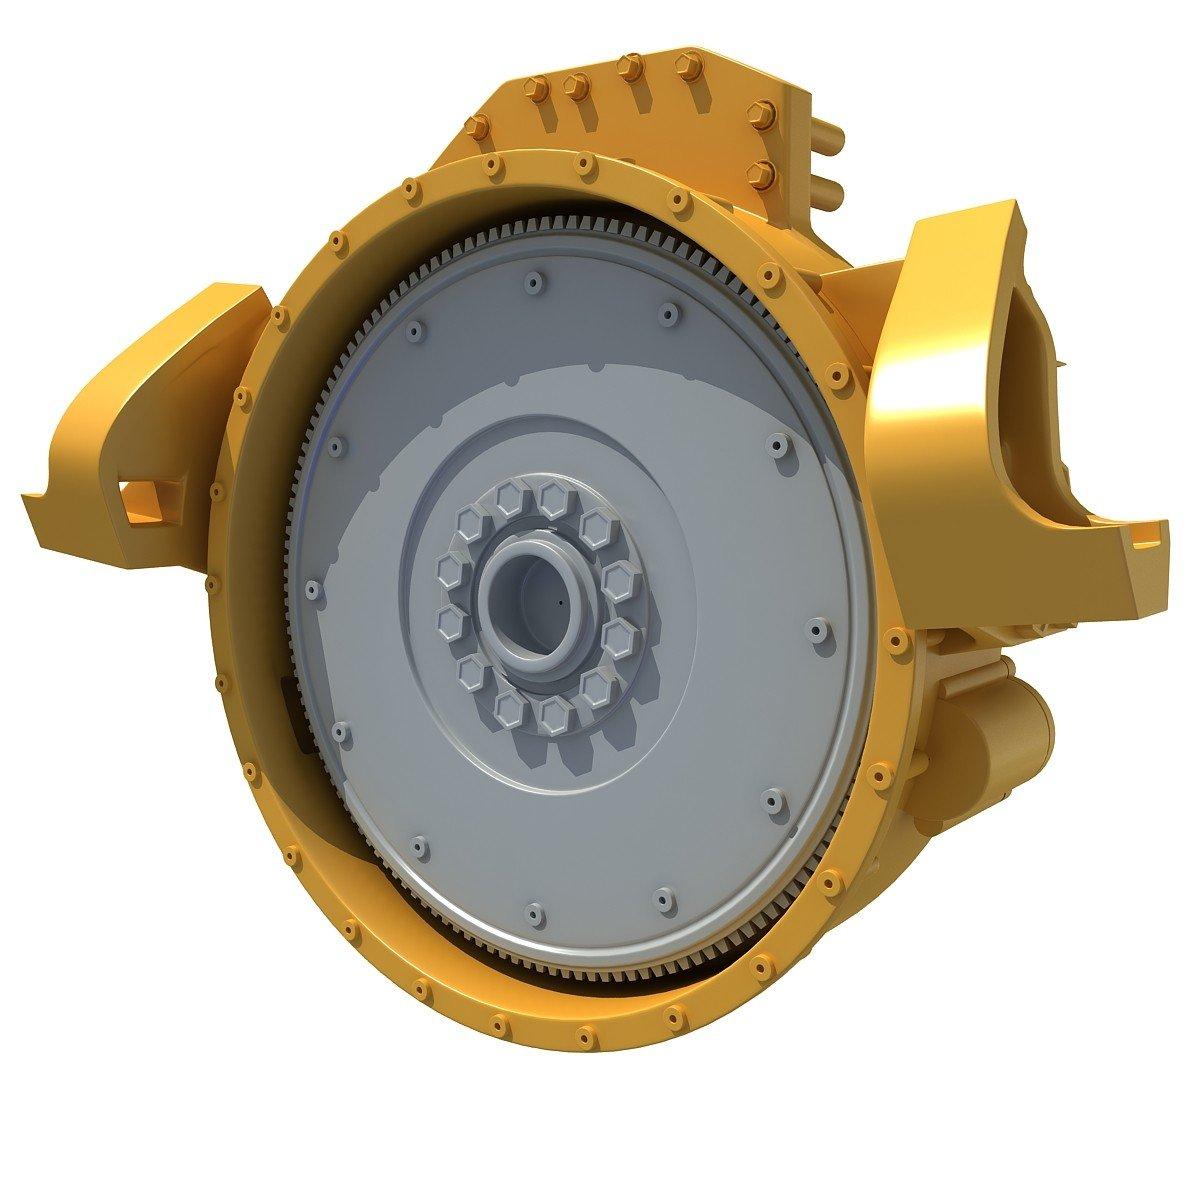 3D Engine Parts  #3D #3dEngine #3dParts http://bit.ly/2AV2zgBpic.twitter.com/Ebg0TDeo45